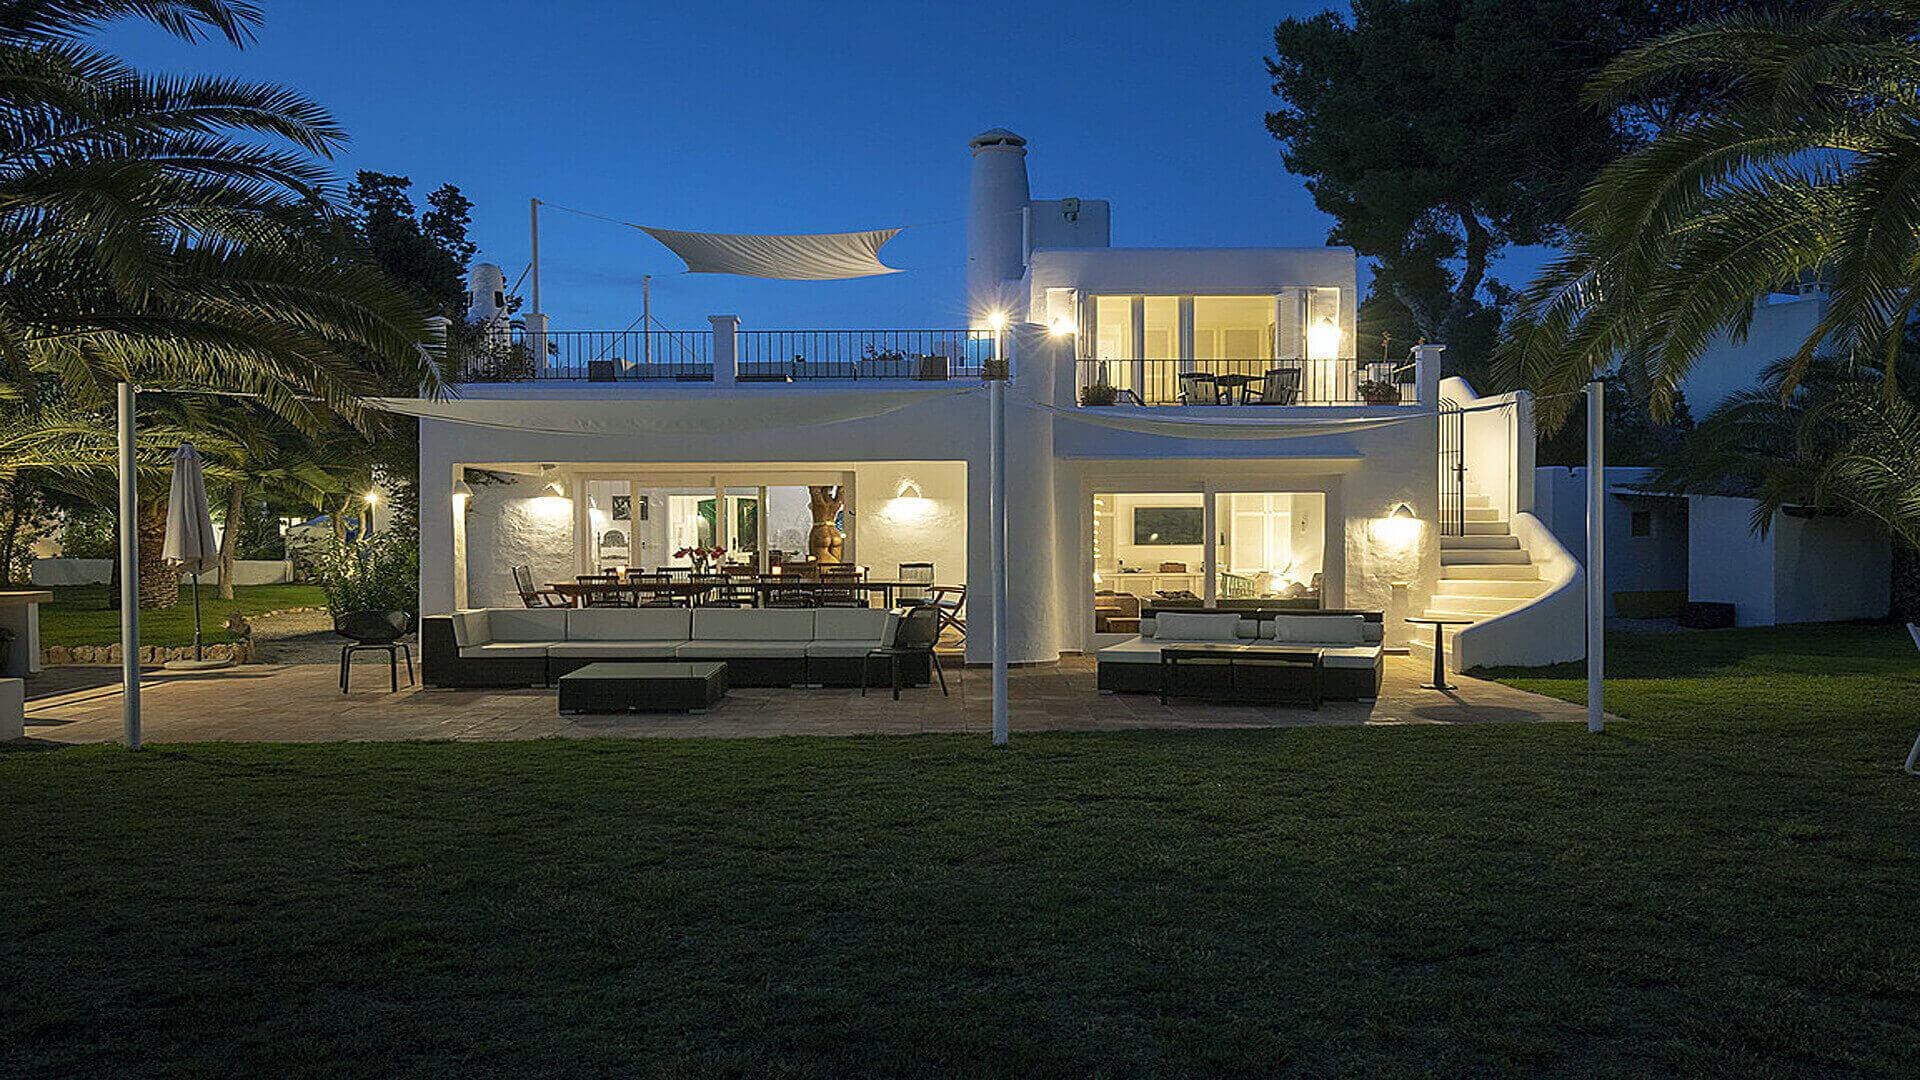 Villa Cigala Ibiza 2 Santa Eulalia